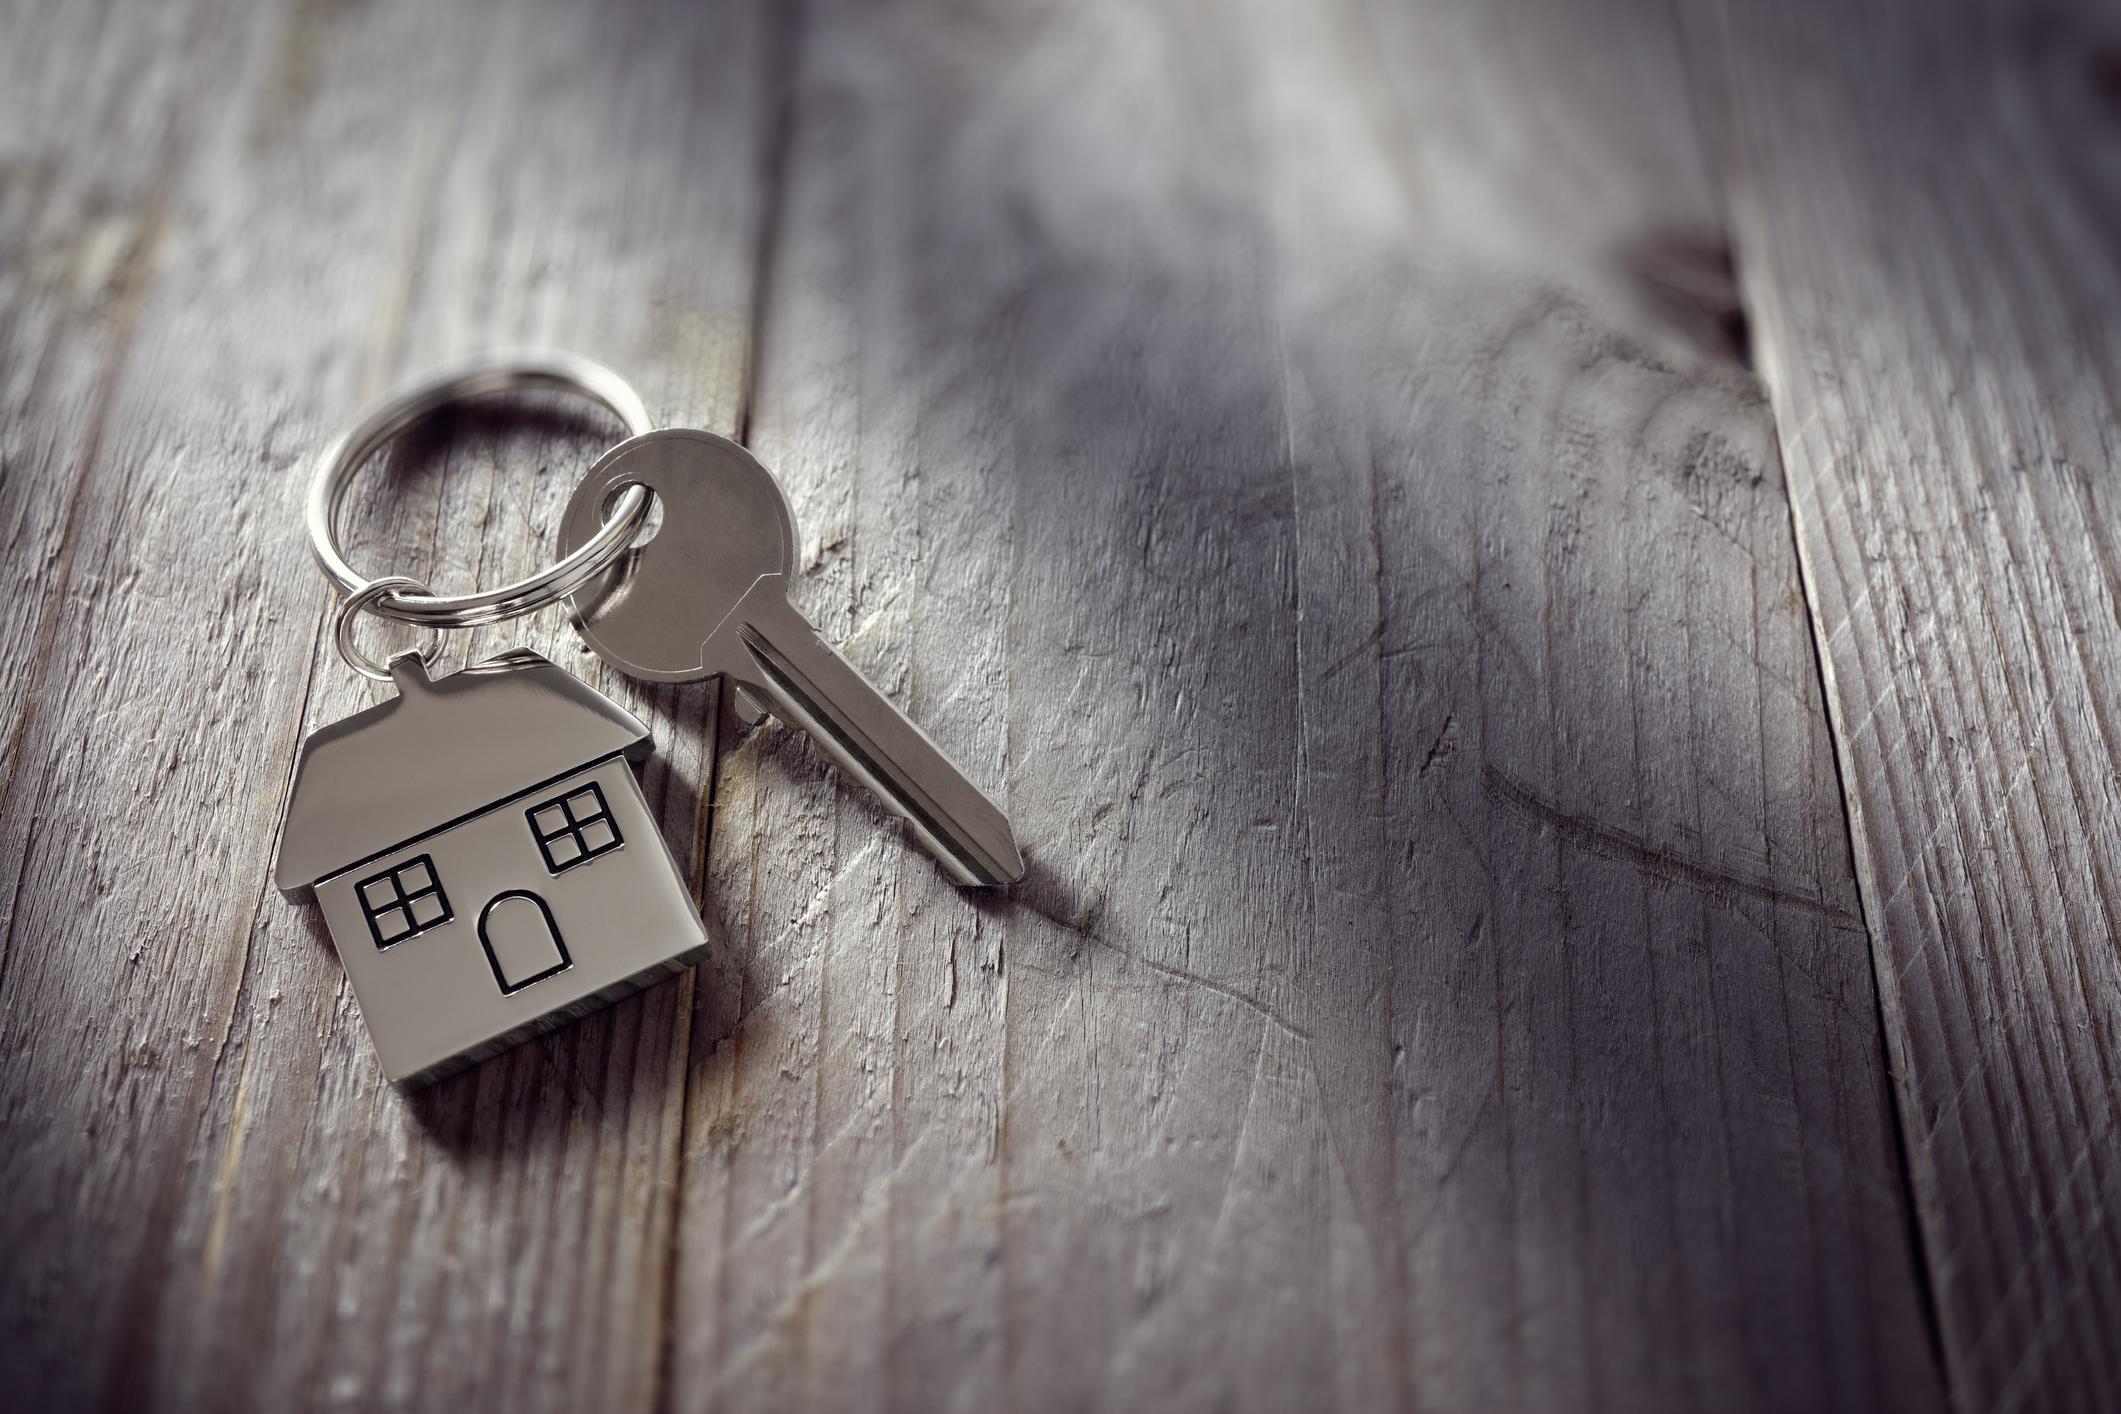 OpenSky's CBL Digital Platform ReducesSocial Housing Refusal Rates